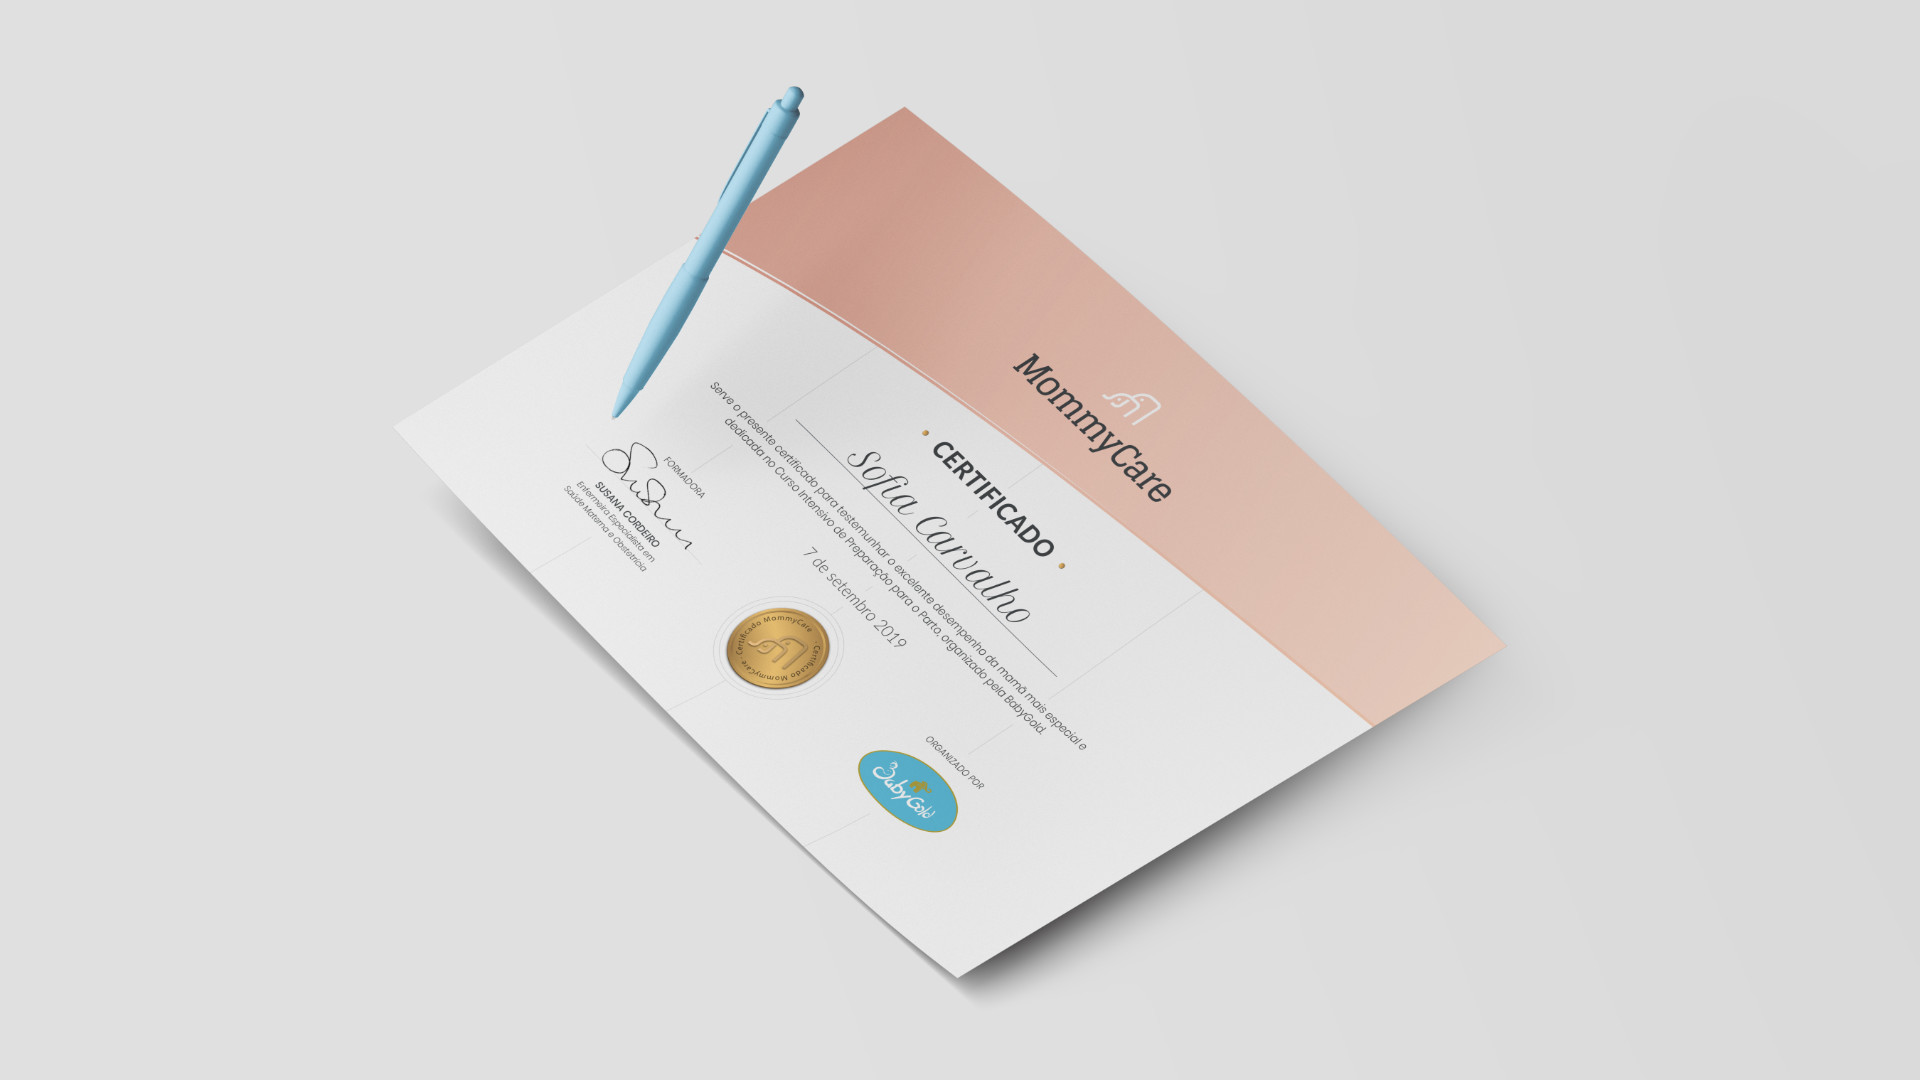 Certificado da MommyCare